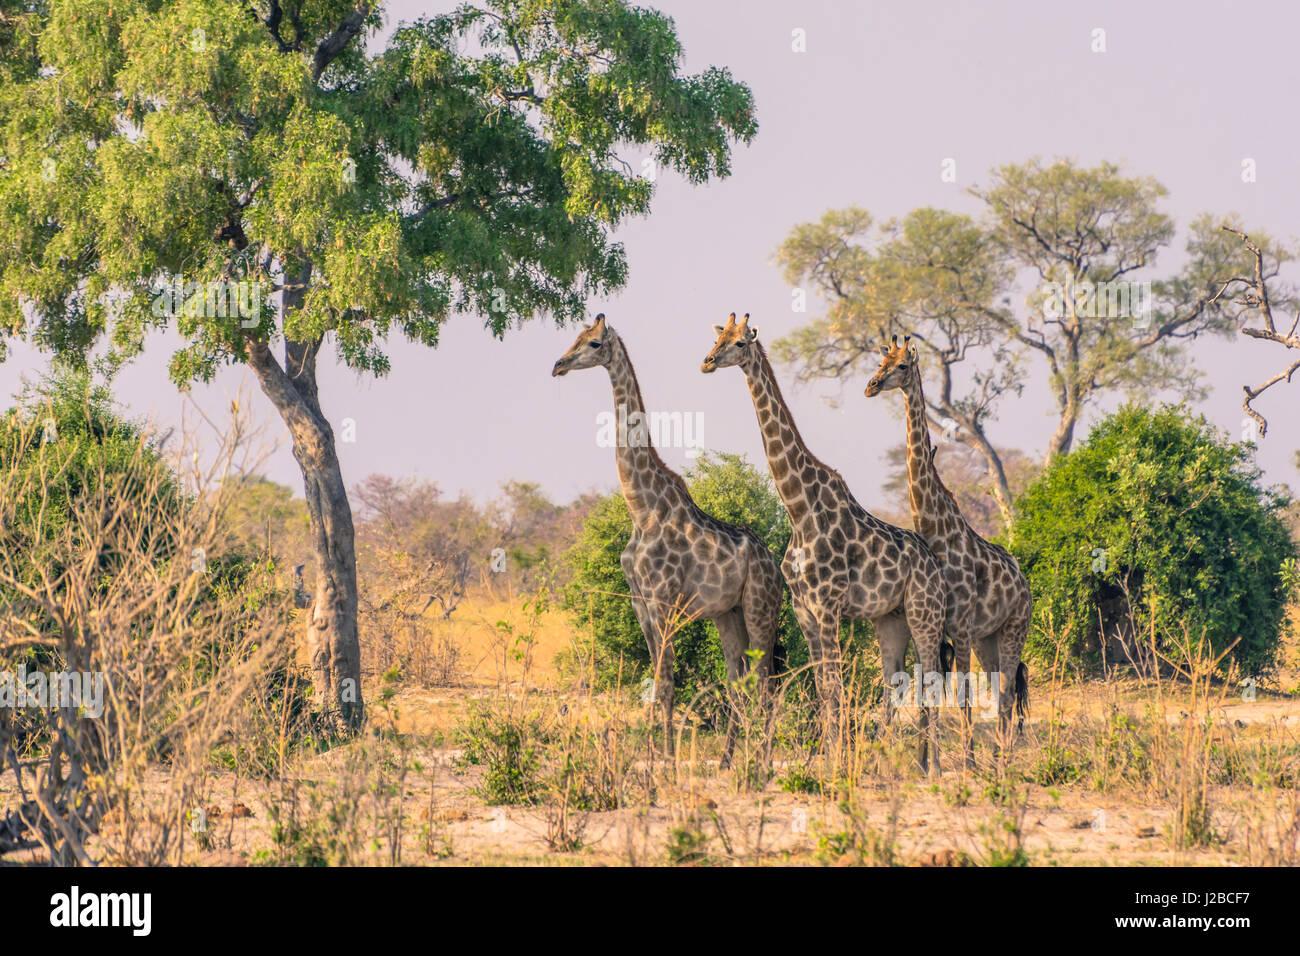 Botswana. Chobe National Park. Savuti. Giraffes intently watching a hidden lion in the bush. - Stock-Bilder